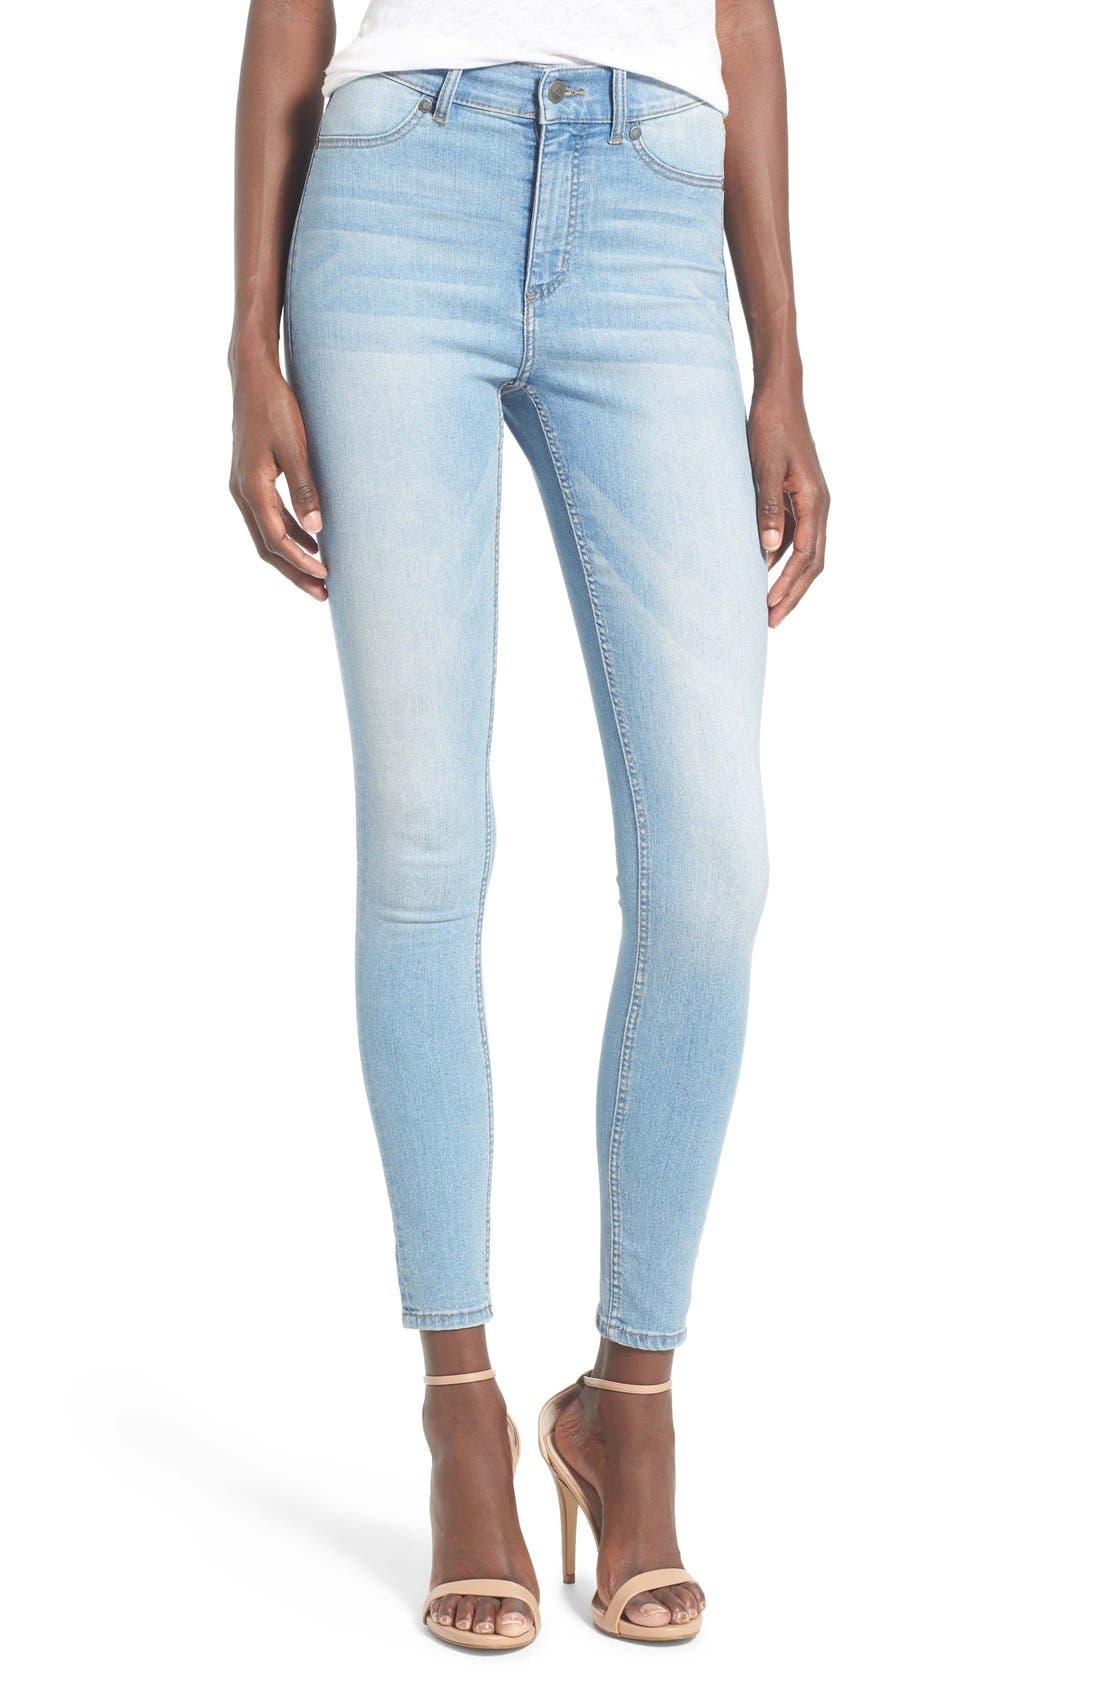 Main Image - Cheap Monday 'High Spray' High Rise Skinny Jeans (Stone Bleach)